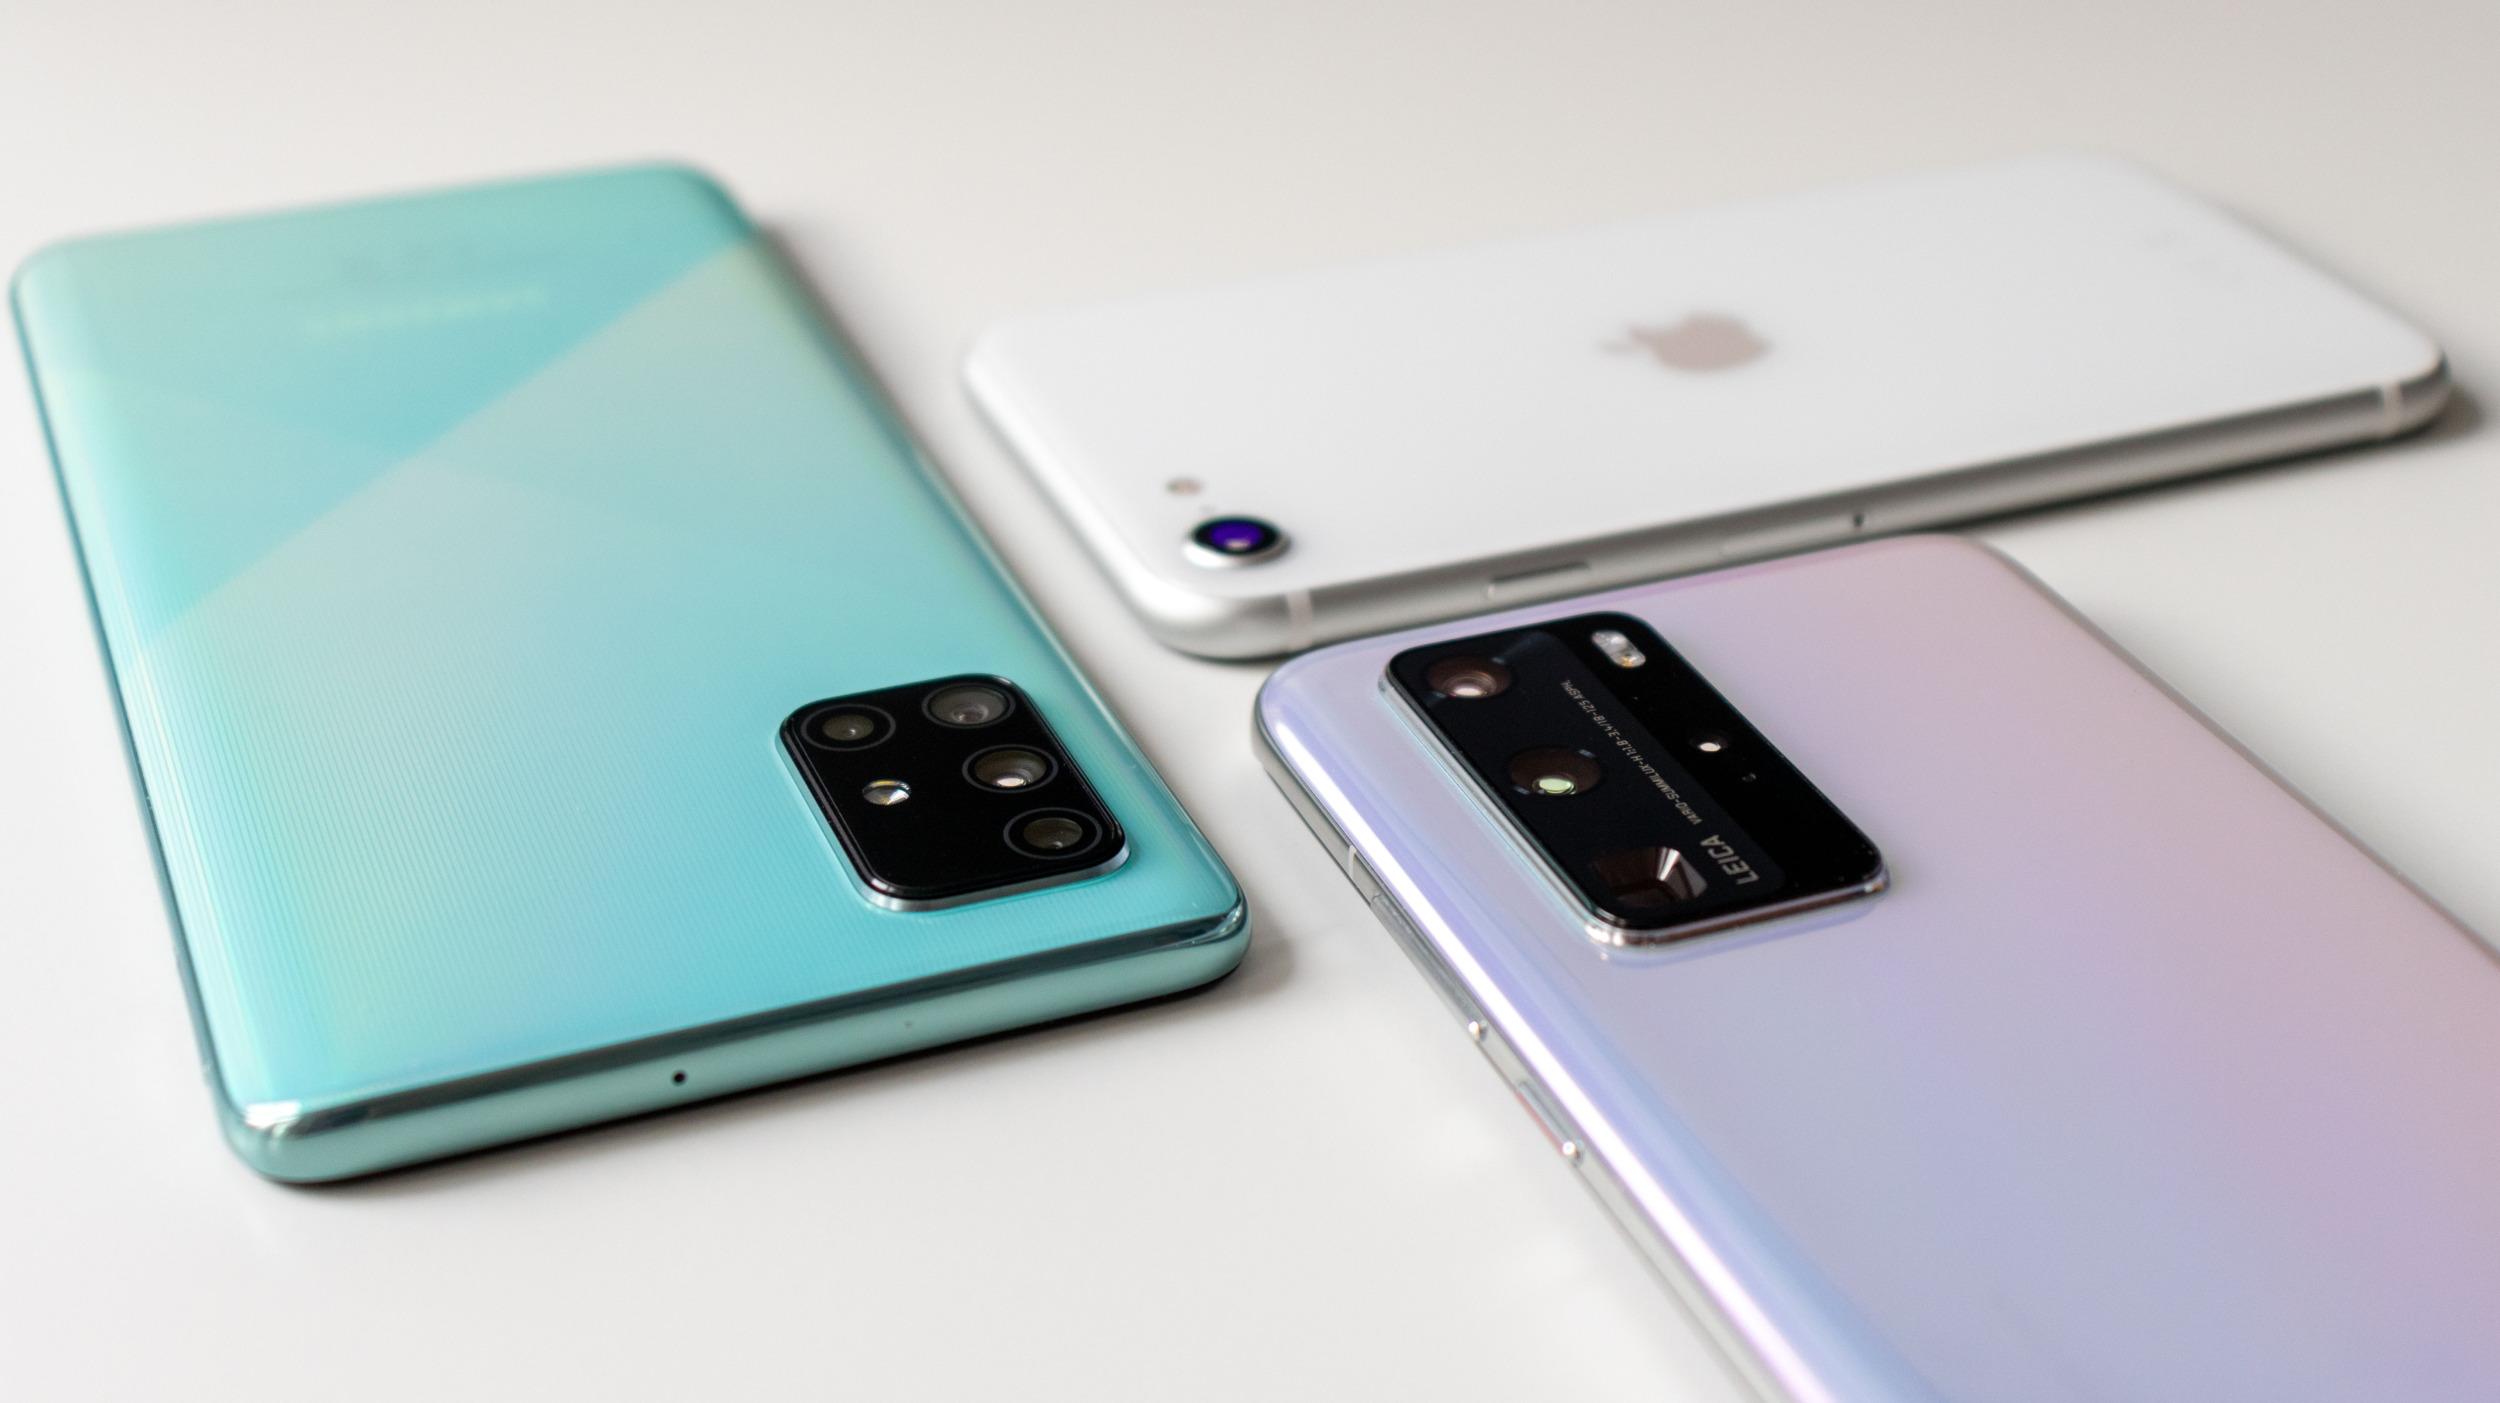 Xiaomi pokořilo Samsung v Česku, Huawei sesazen a Realme je skokanem